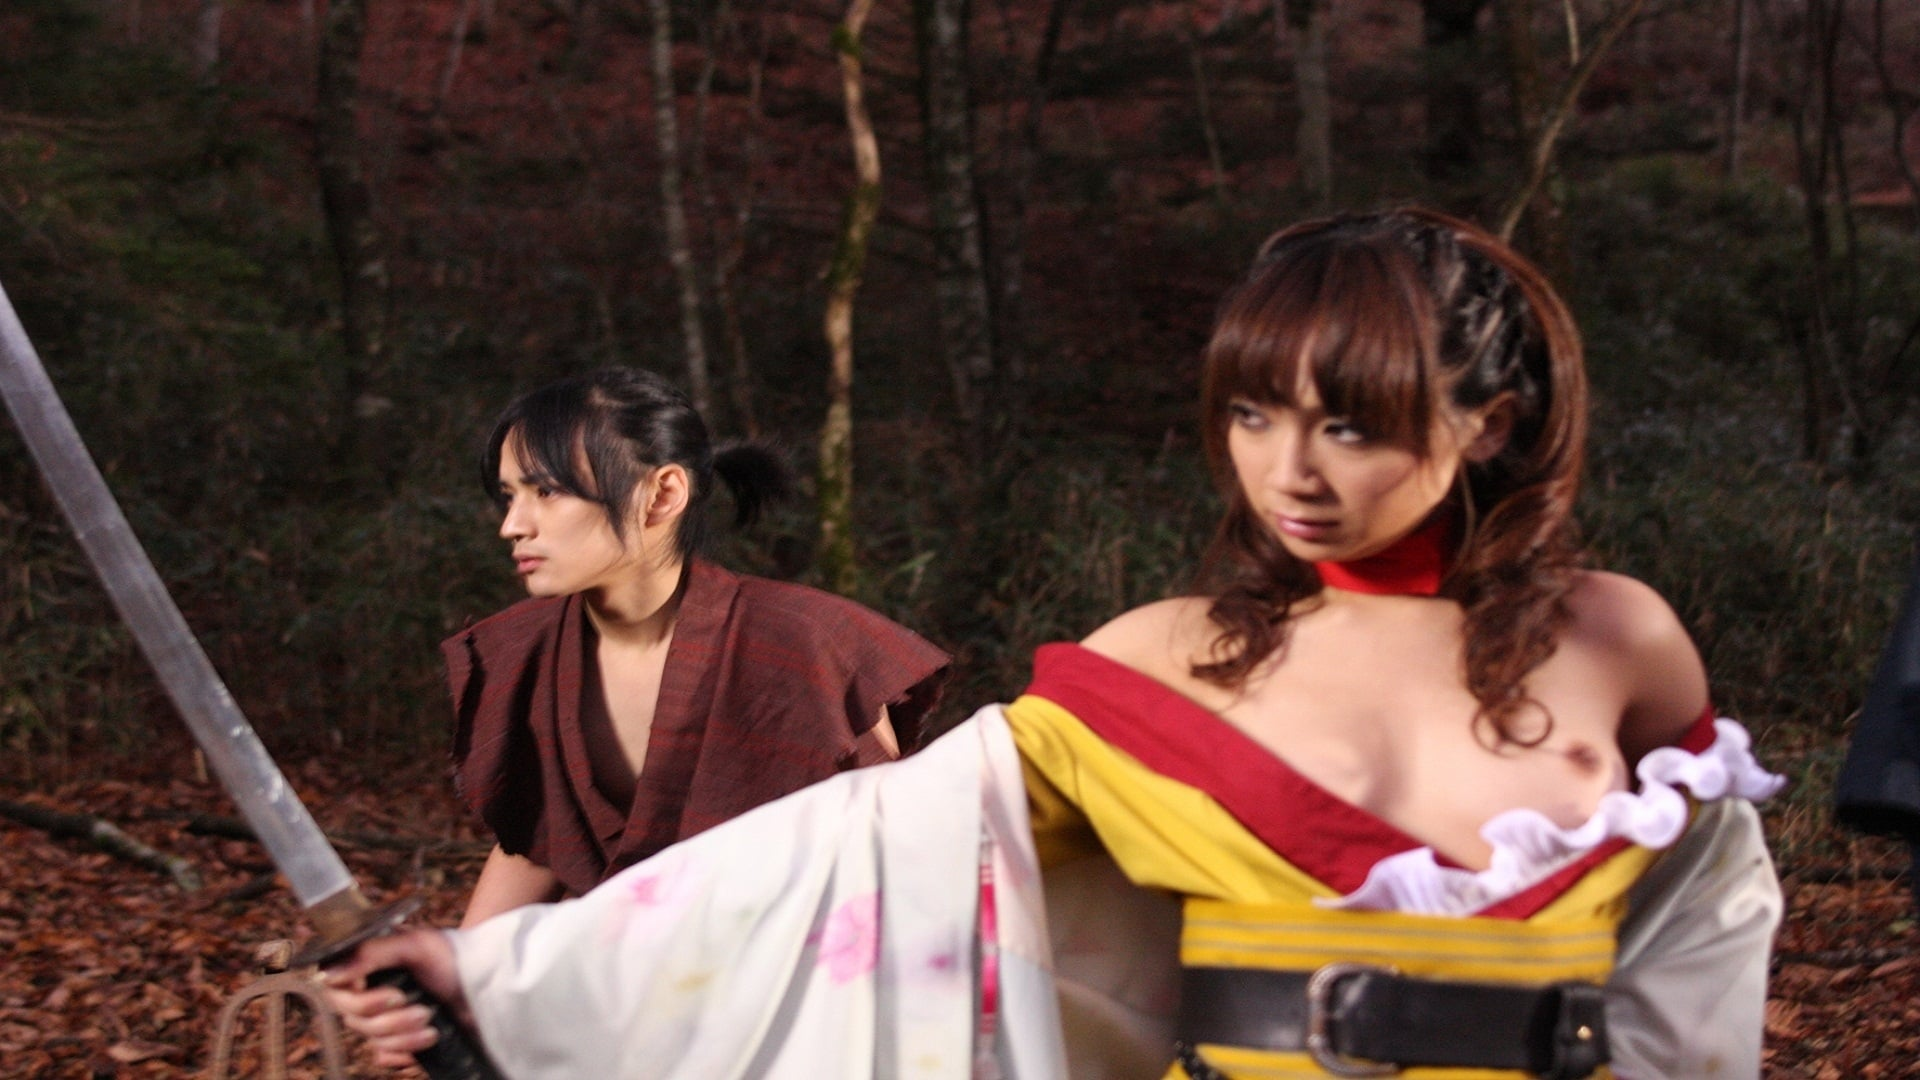 watch chanbara striptease free movies online movie times